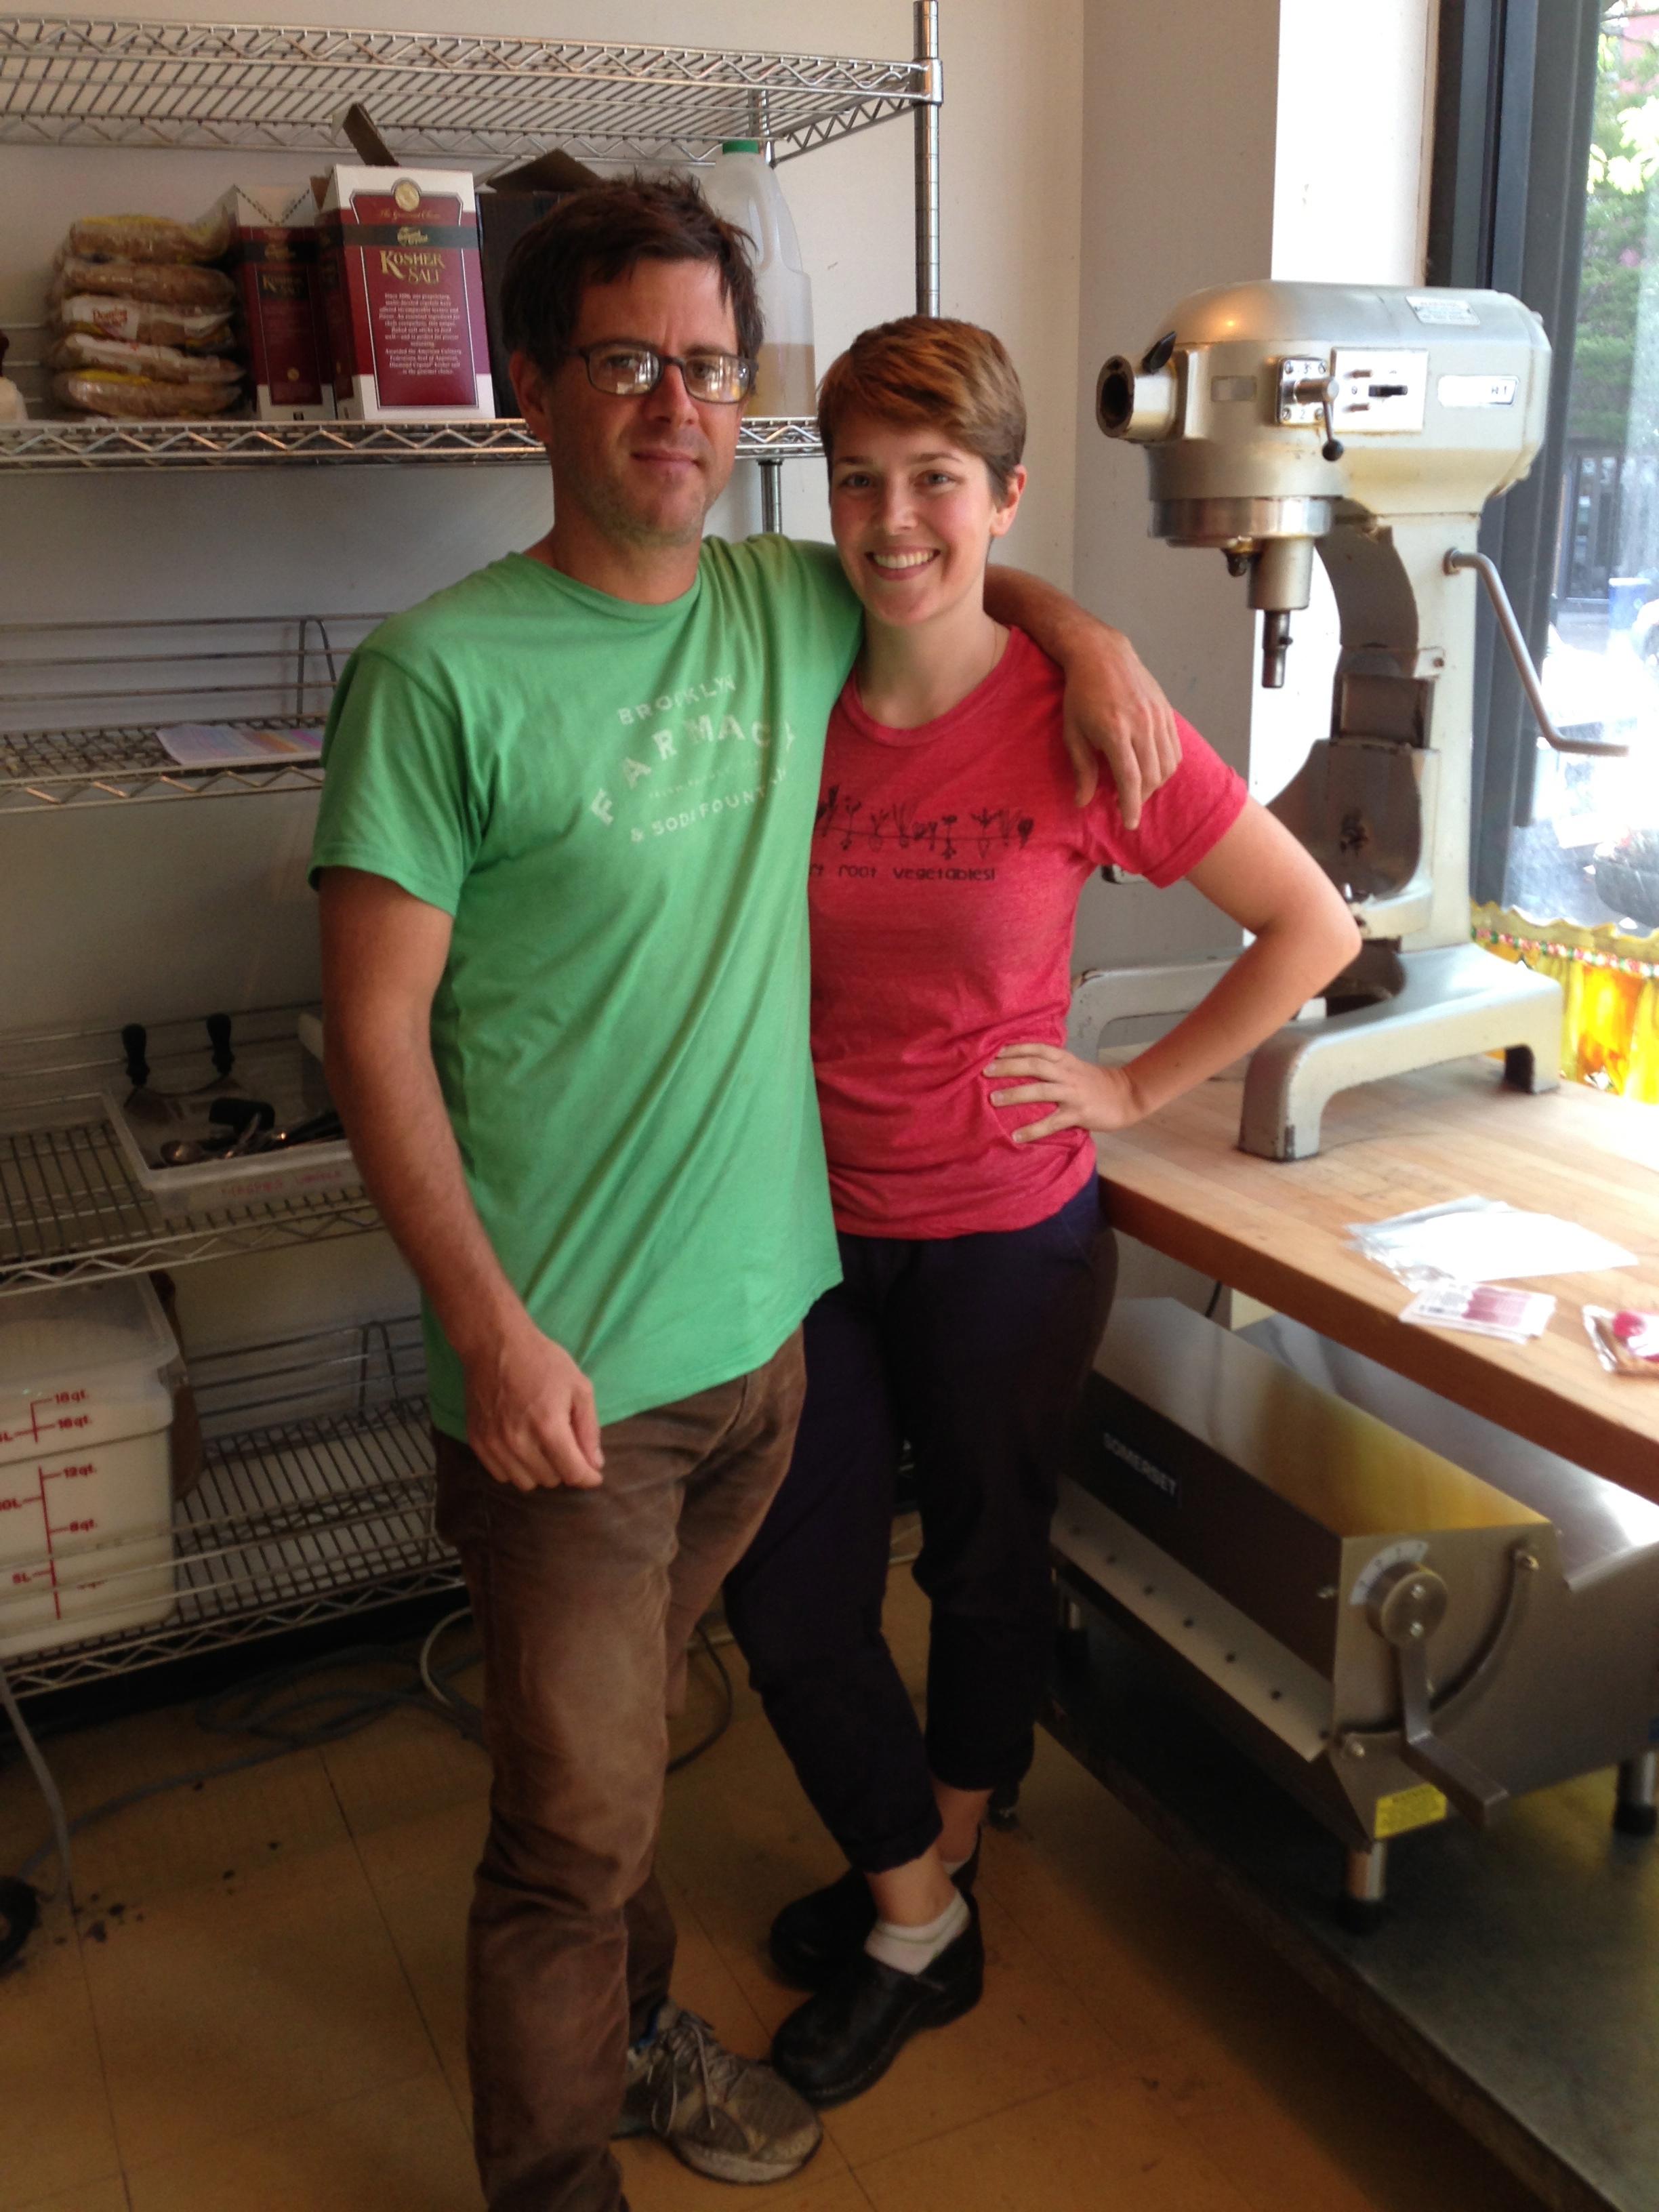 Paul Jones and Meghan Ritchie, Sept. 2013